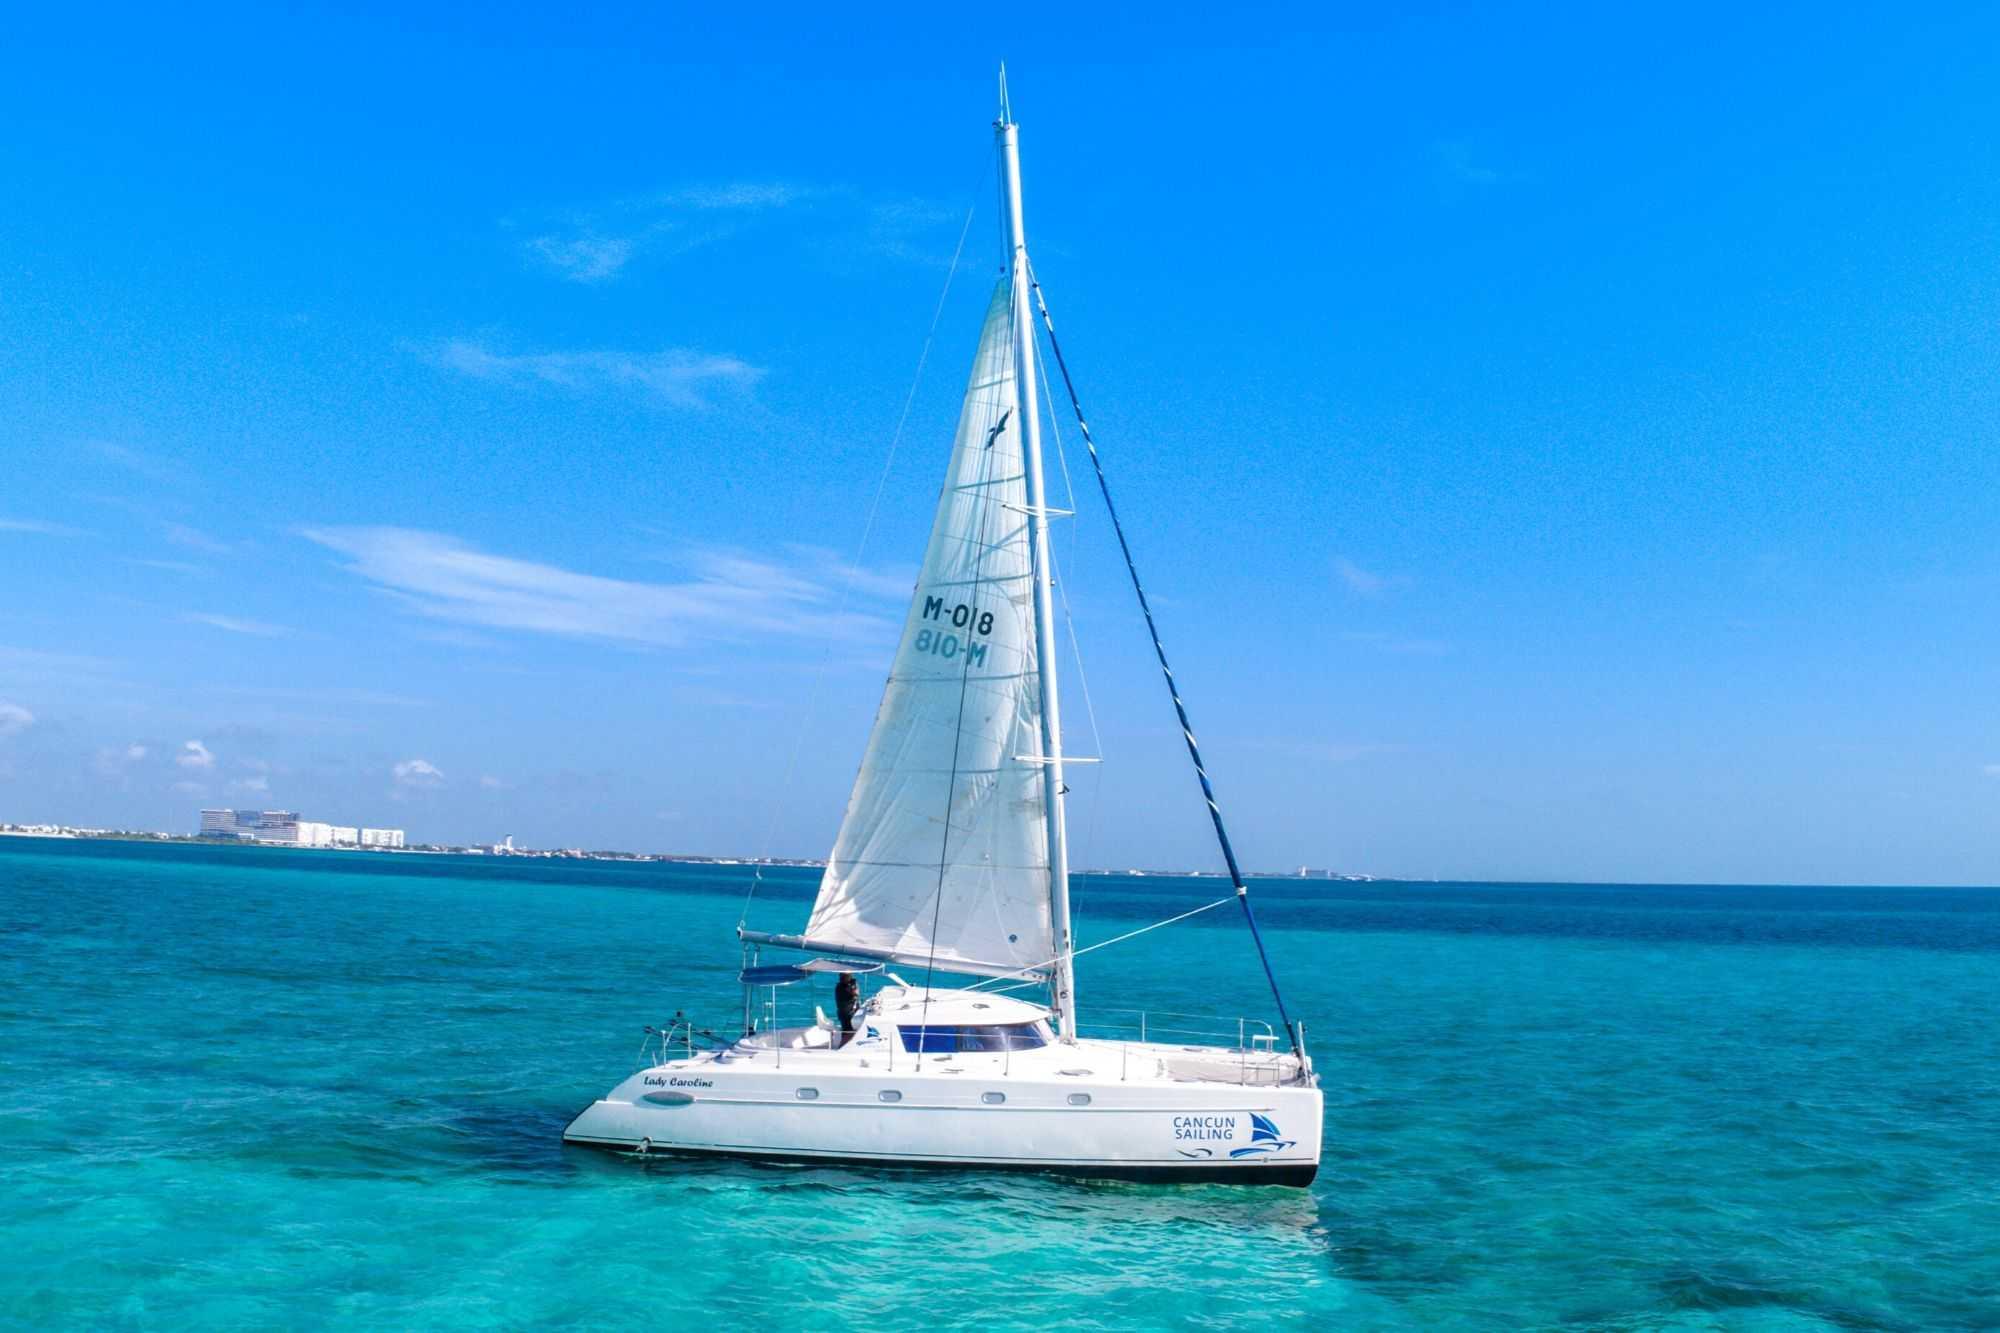 Lady Caroline - Isla Mujeres Catamaran Tour - Cancun Sailing - 4